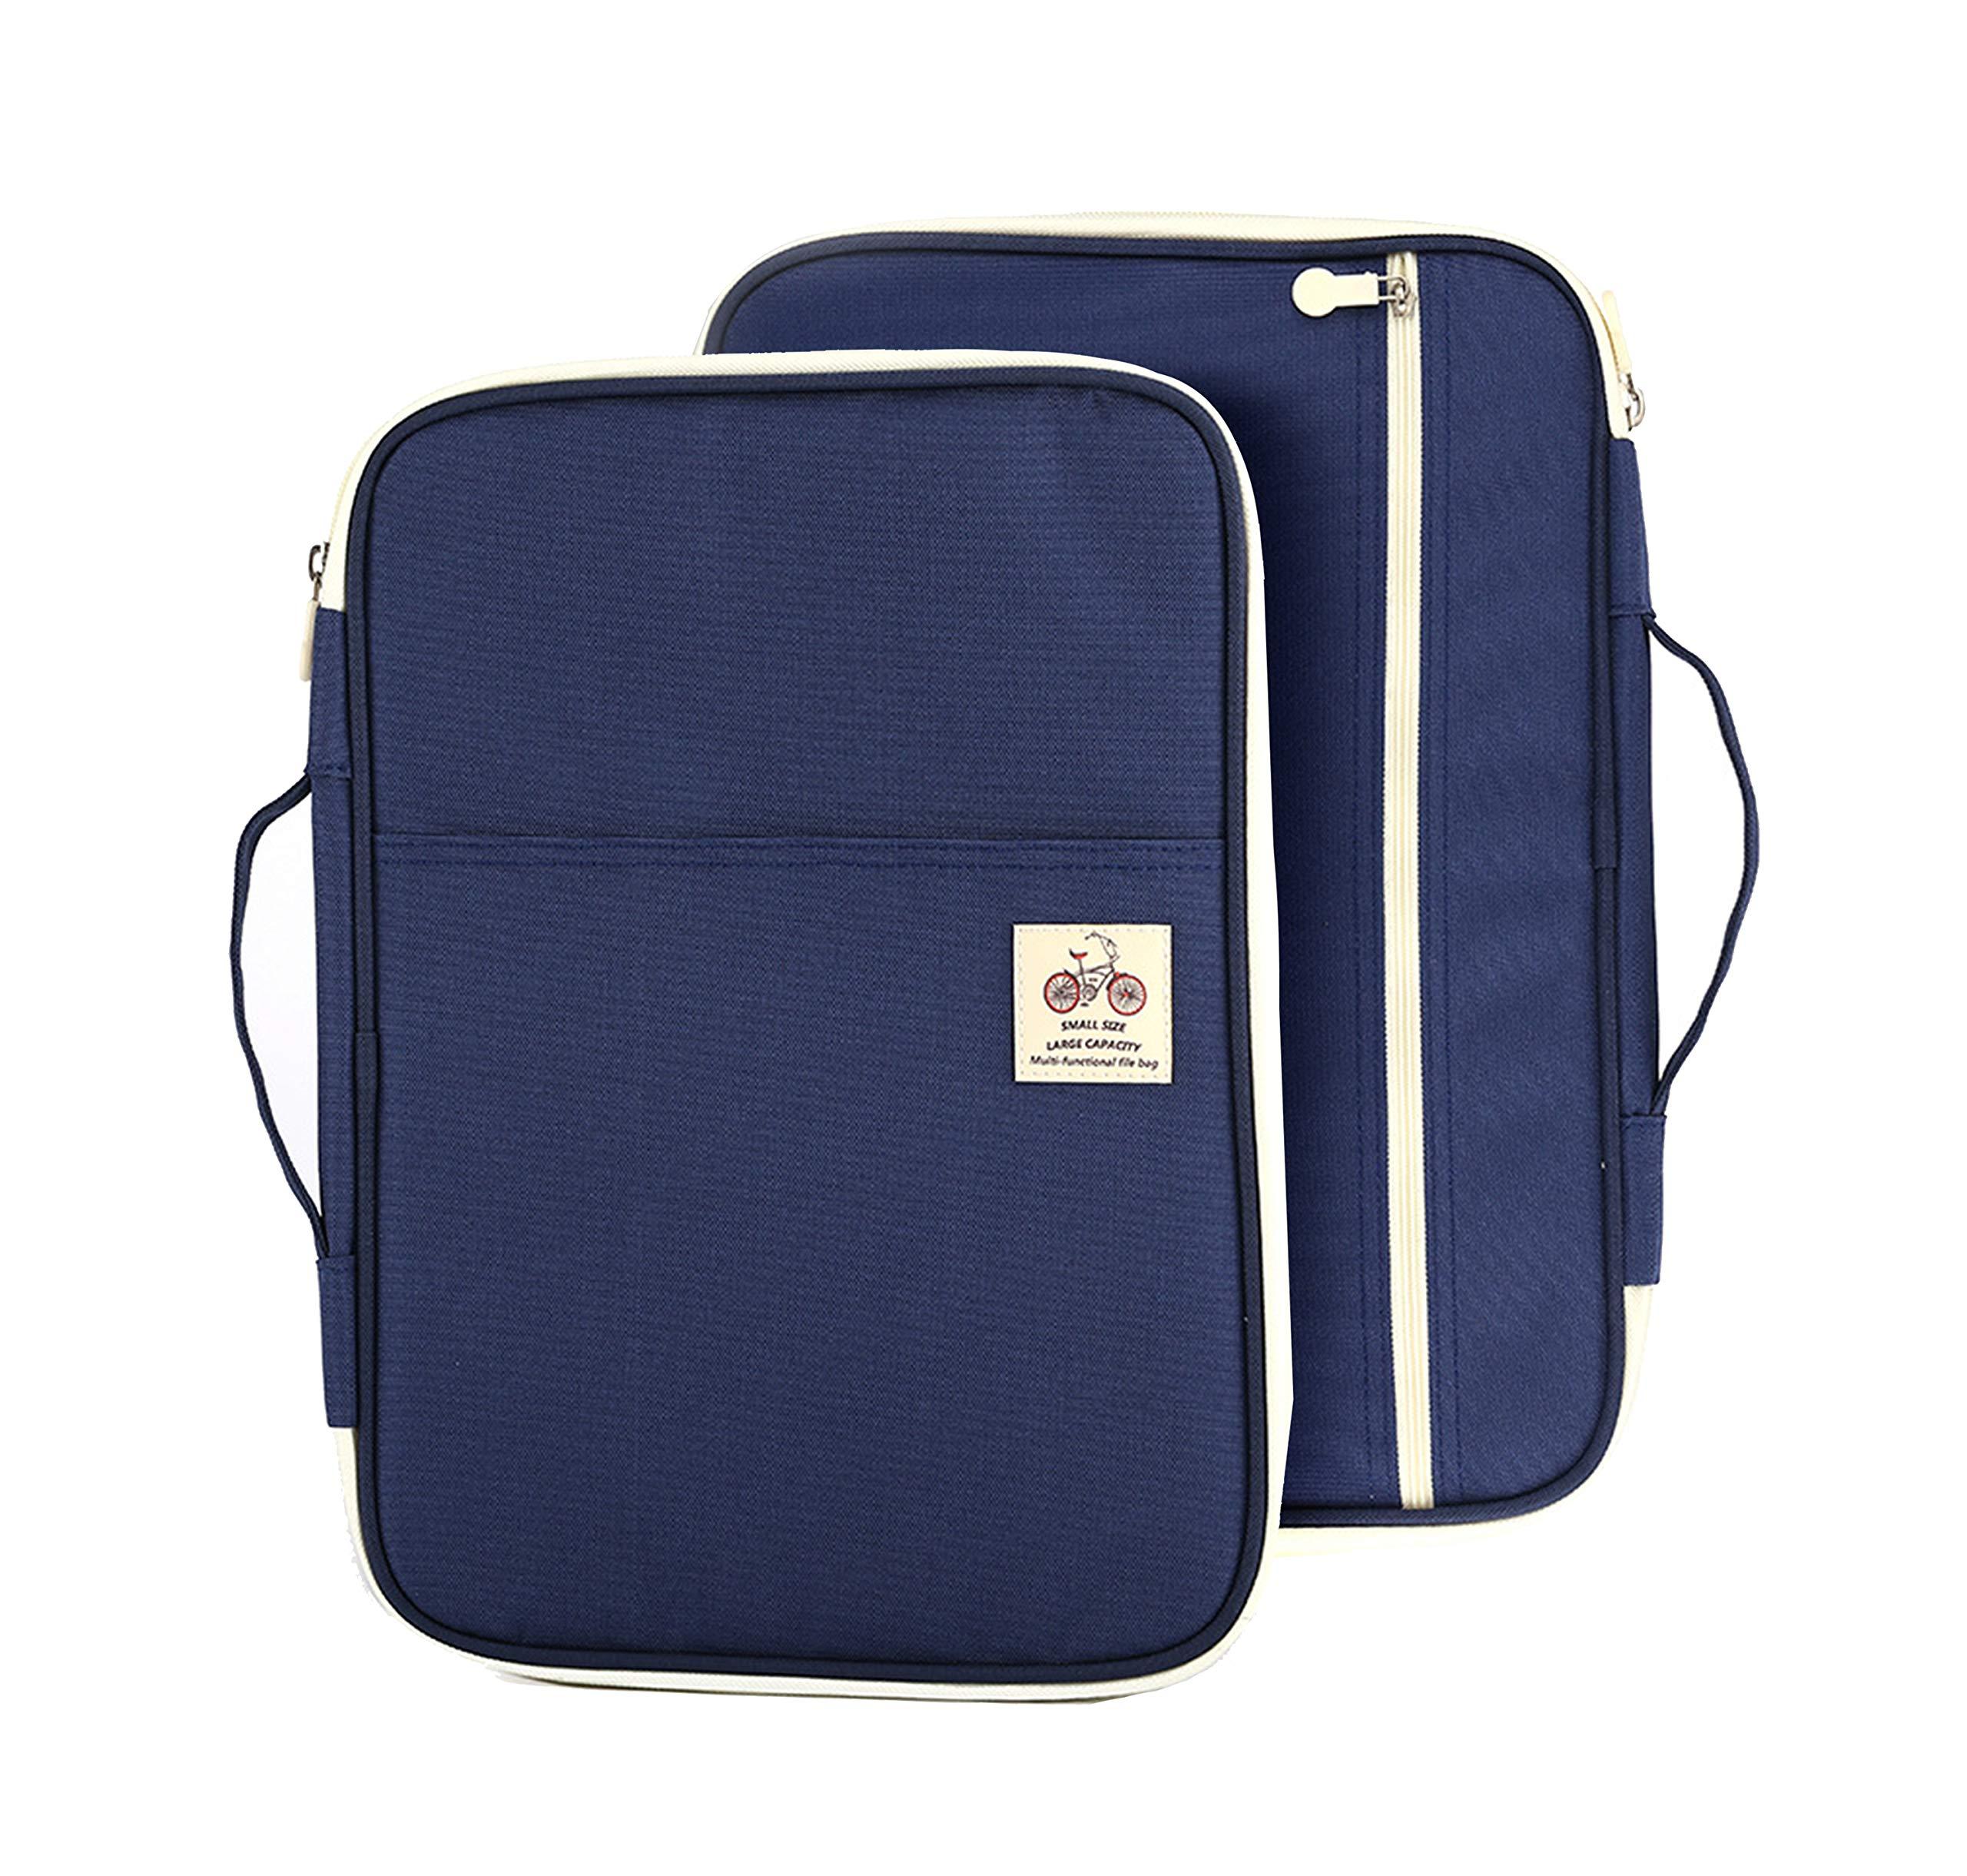 "Lazyaunti Zipper Portfolio Organizer A4 Note Pouch-Waterproof Document Bags/Zipper Binder/Paper Case for 12.5"" Mac,Tablet,Pens,washi Tape,Journals,Sketch Books(Navy Blue)"